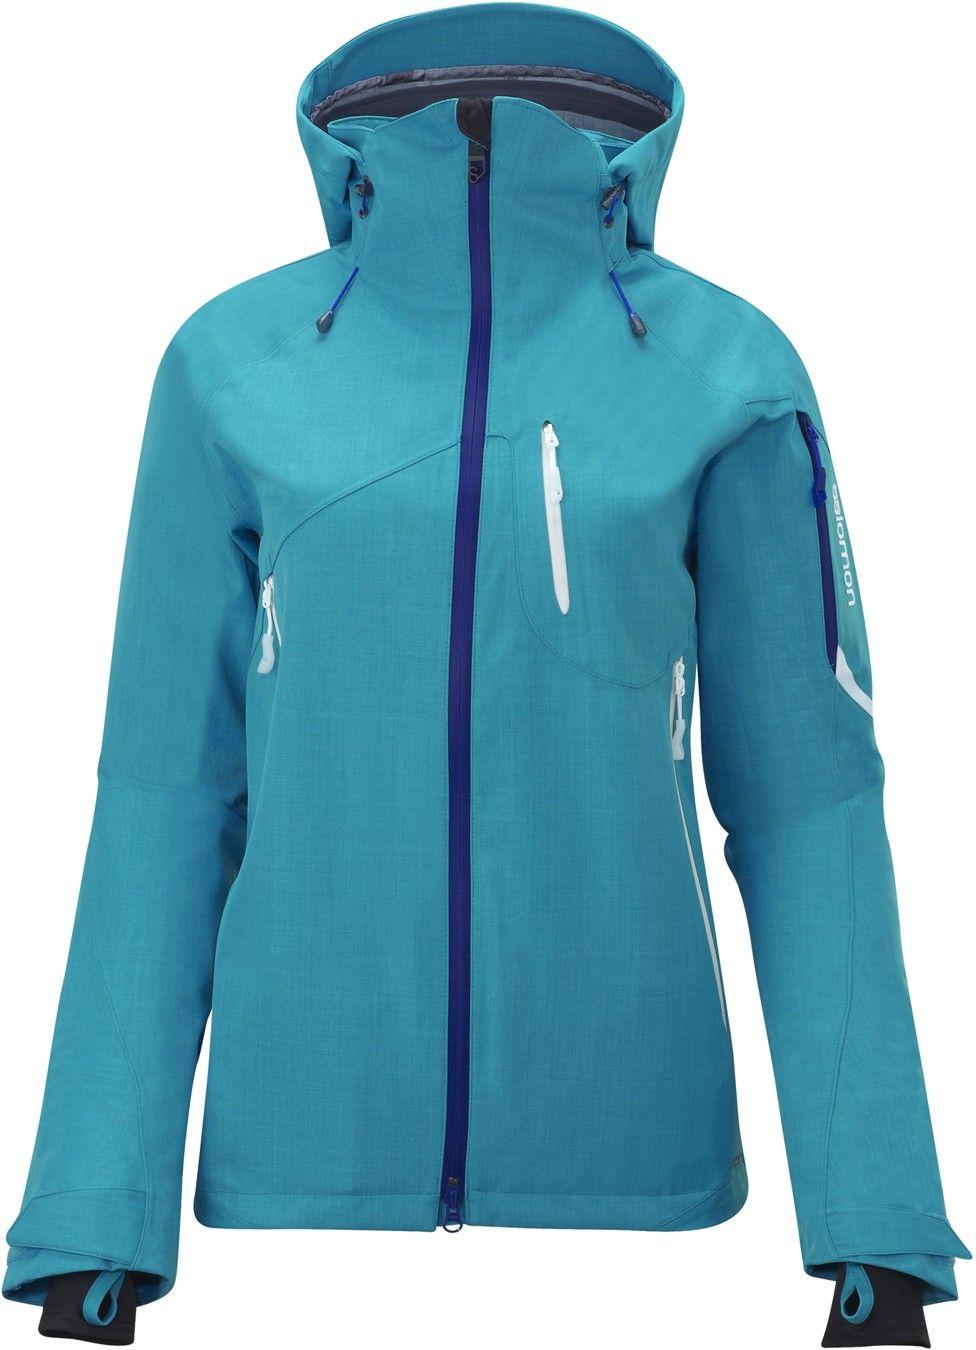 SIDEWAYS 3L JACKET W - Freeski Jackets - Clothing - Alpine Skiing - Salomon Usa